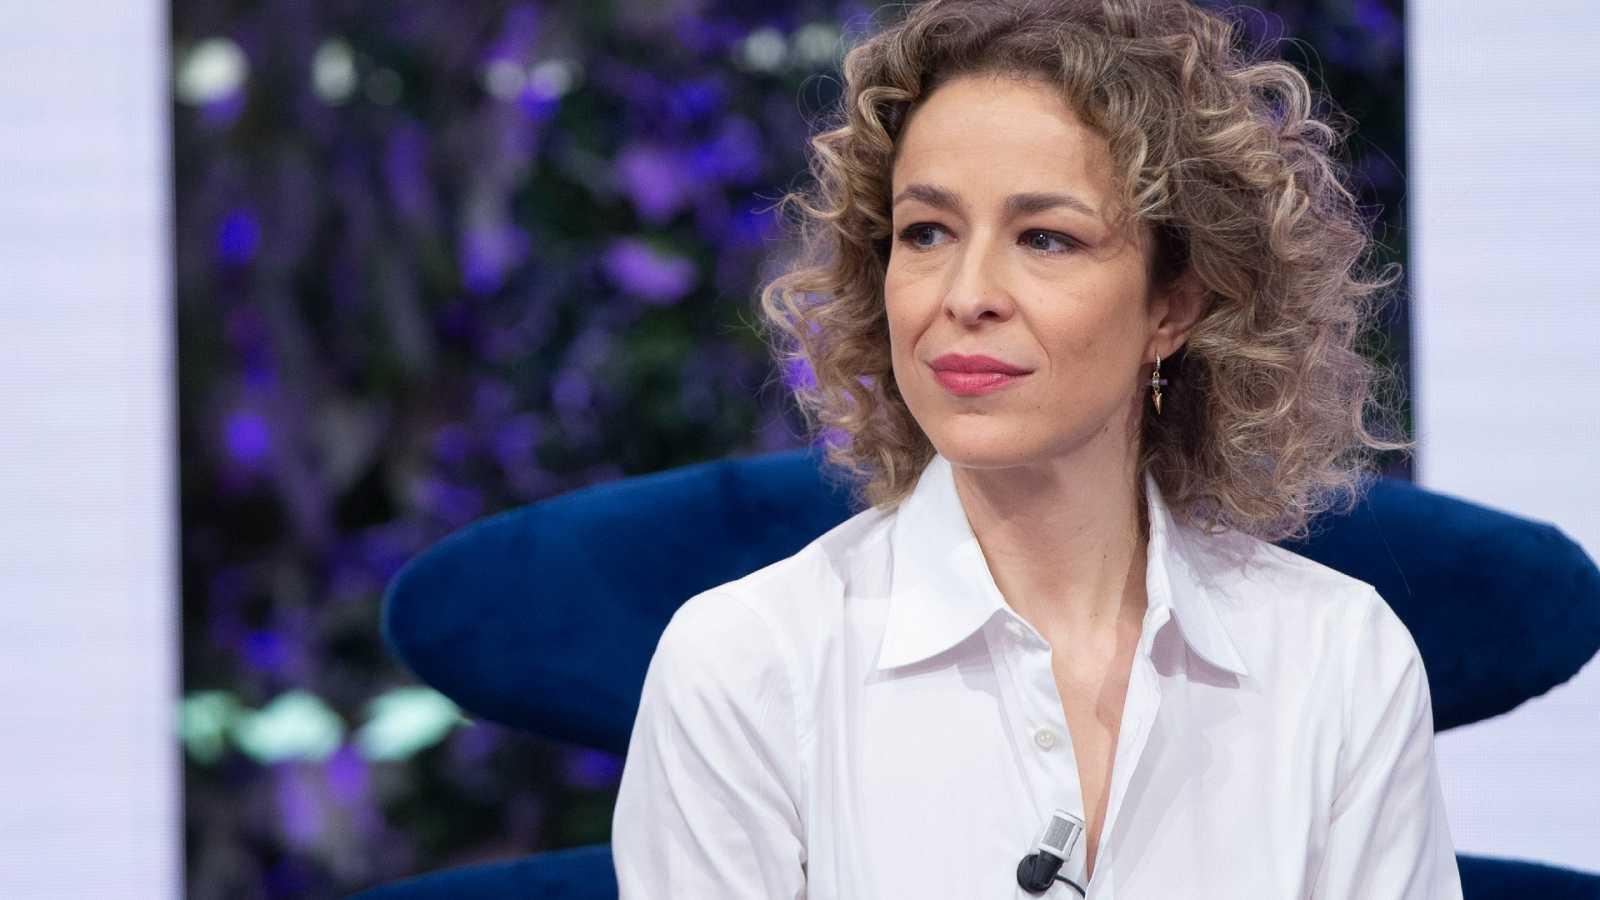 Silvia Abascal en La Hora de la 1 de TVE